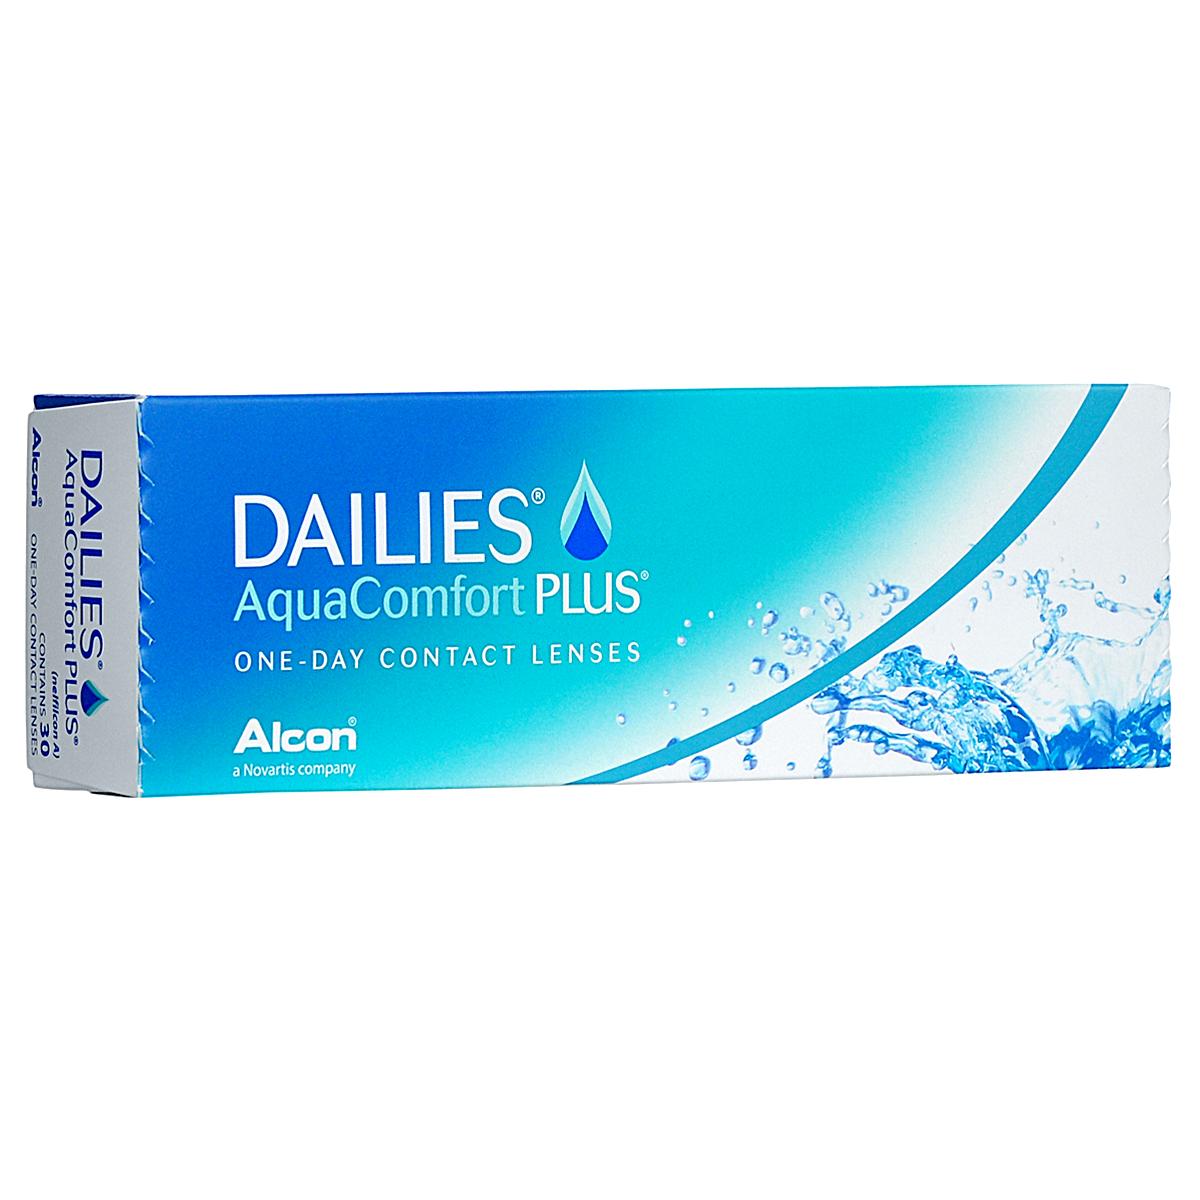 CIBA ���������� ����� Dailies AquaComfort Plus (30�� / 8.7 / 14.0 / -4.00) - Ciba Vision38453Dailies AquaComfort Plus - ��� ���� �� ����� ���������� ����������� ���� ������������ �������� Ciba Vision. ��� ����� ���������� �������� ������������� �� ���� ���� � �������� �� ����������� ���� ������ ����������� ����������� �������. ��������������� ����� �� ������������, 100% ����������� ��������� ��������� �. ����������� ����� ��������� � ���, ��� �� ����� ���������� ������ � ������ ��������� �����. ����������� ���������� ����� Dailies AquaComfort Plus �� ��������� � �������������� ����� � ��������, ������ ���� �� ��������� ������ ���� ����. ������ ����� ��������������, ��� ����������� ����������� �������. ����� ������� ����������� Dailies AquaComfort Plus - ��� �� ���������� ������� ����������. ��������� ���� ���������� ����� ����������� ����� ���������� ��������. ������ ���������, ����������� �� �������, ��������� � ��������, �� ��� �� ������������ �����, ����������� ����������� ���������� ���������. ������ ����� ���������� �� ���������� ����� ���, ��...